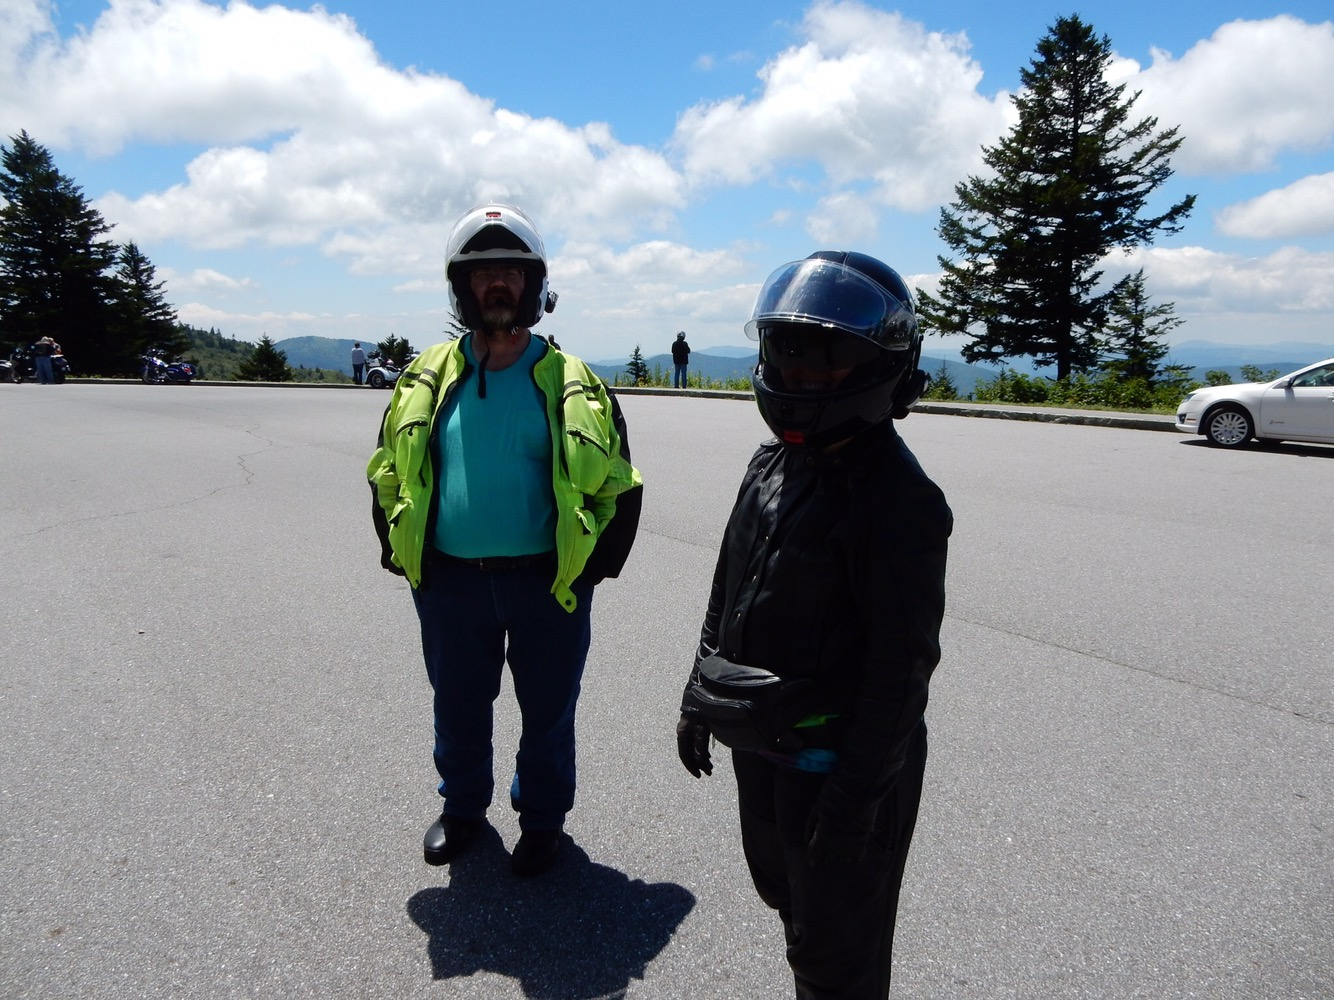 MISFIT group riders.MISFIT group riders.